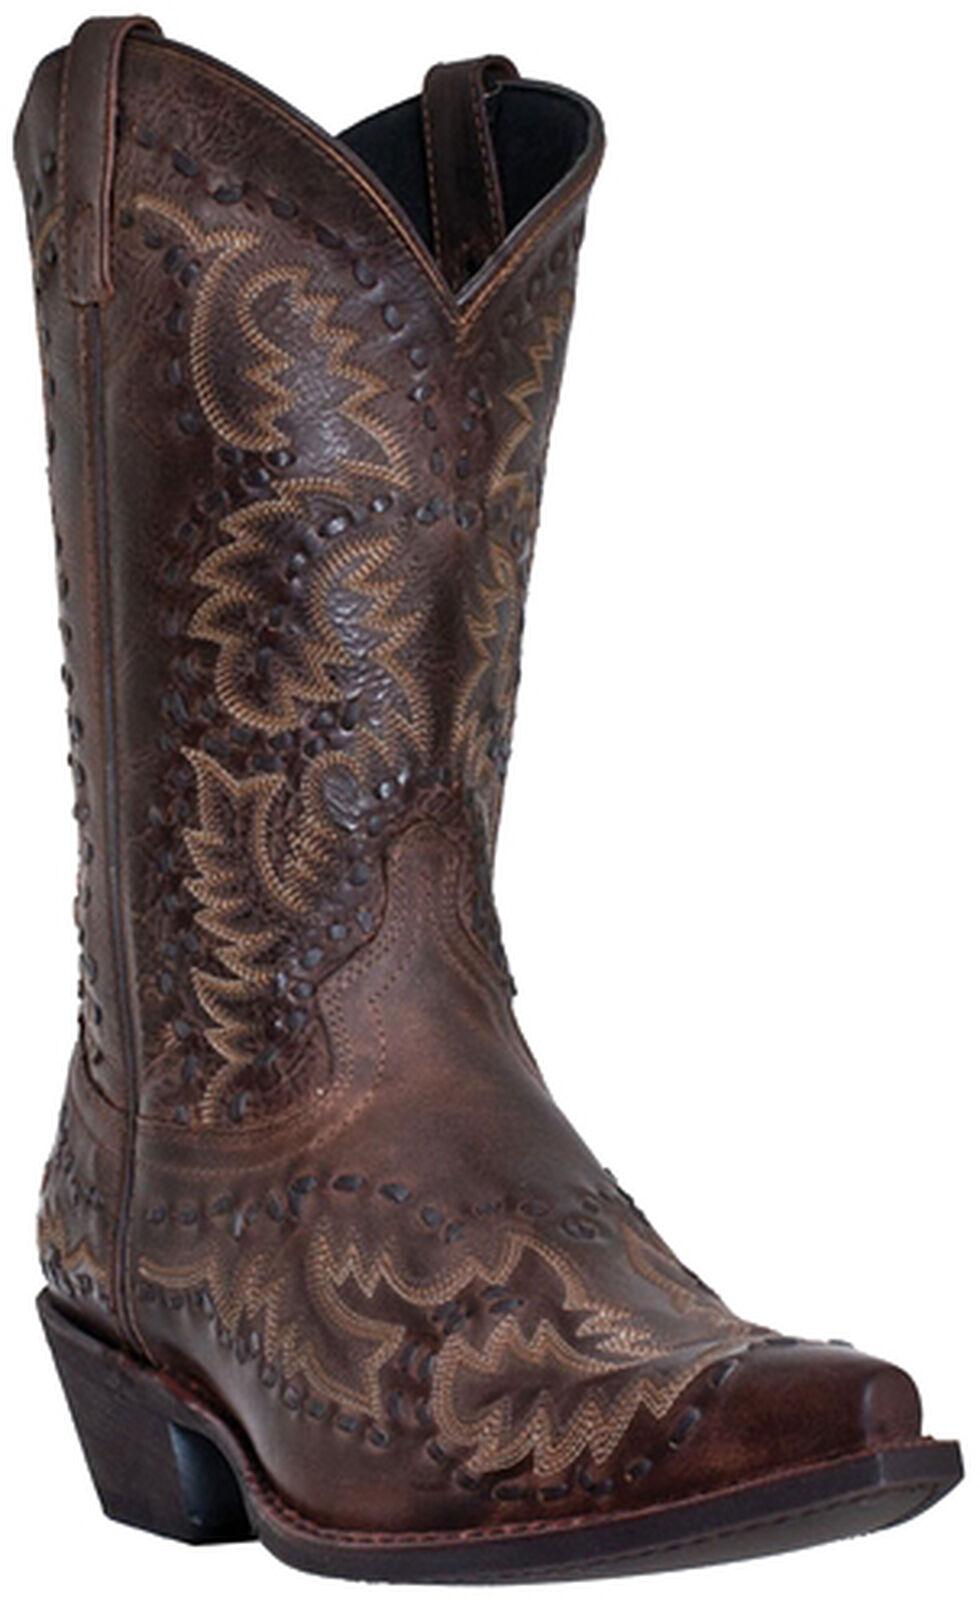 Laredo Midnight Rider Cowboy Boots - Snip Toe, Burgundy, hi-res